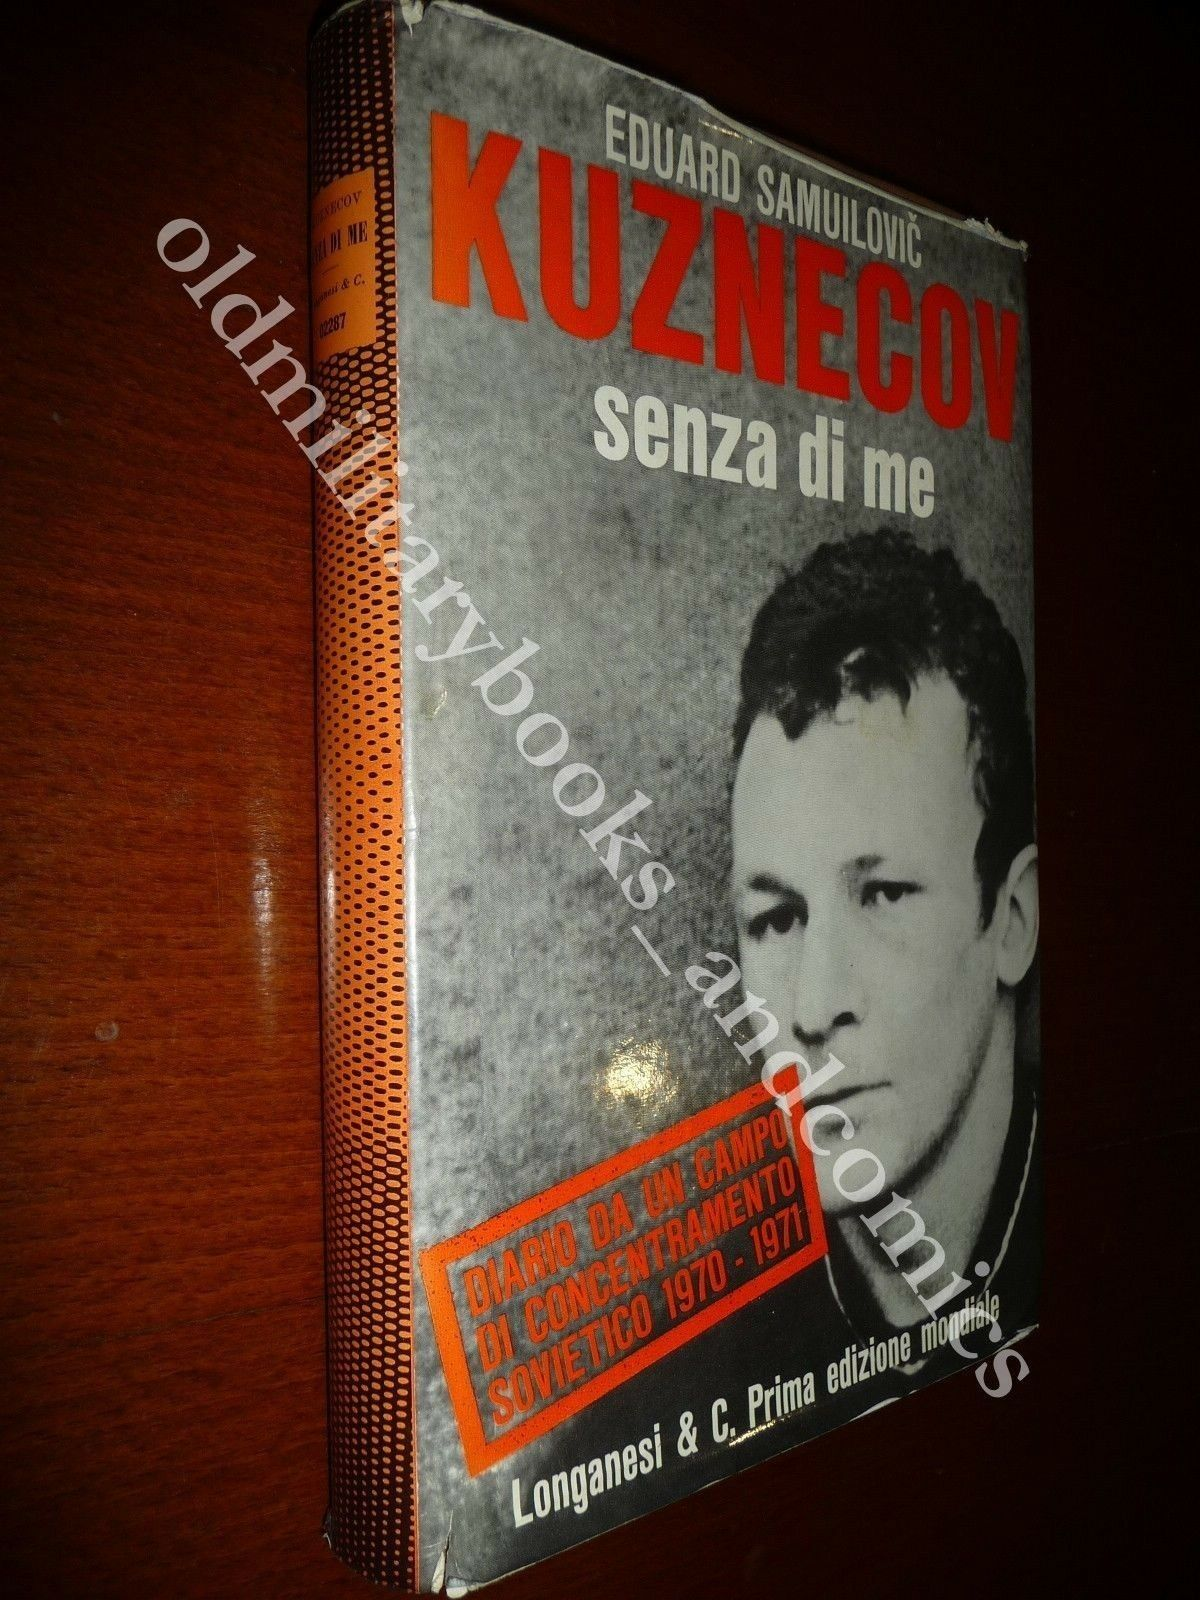 SENZA DI ME EDUARD SAMUILOVIC KUZNECOV DIARIO DA CAMPO CONCENTRAMENTO SOVIETICO